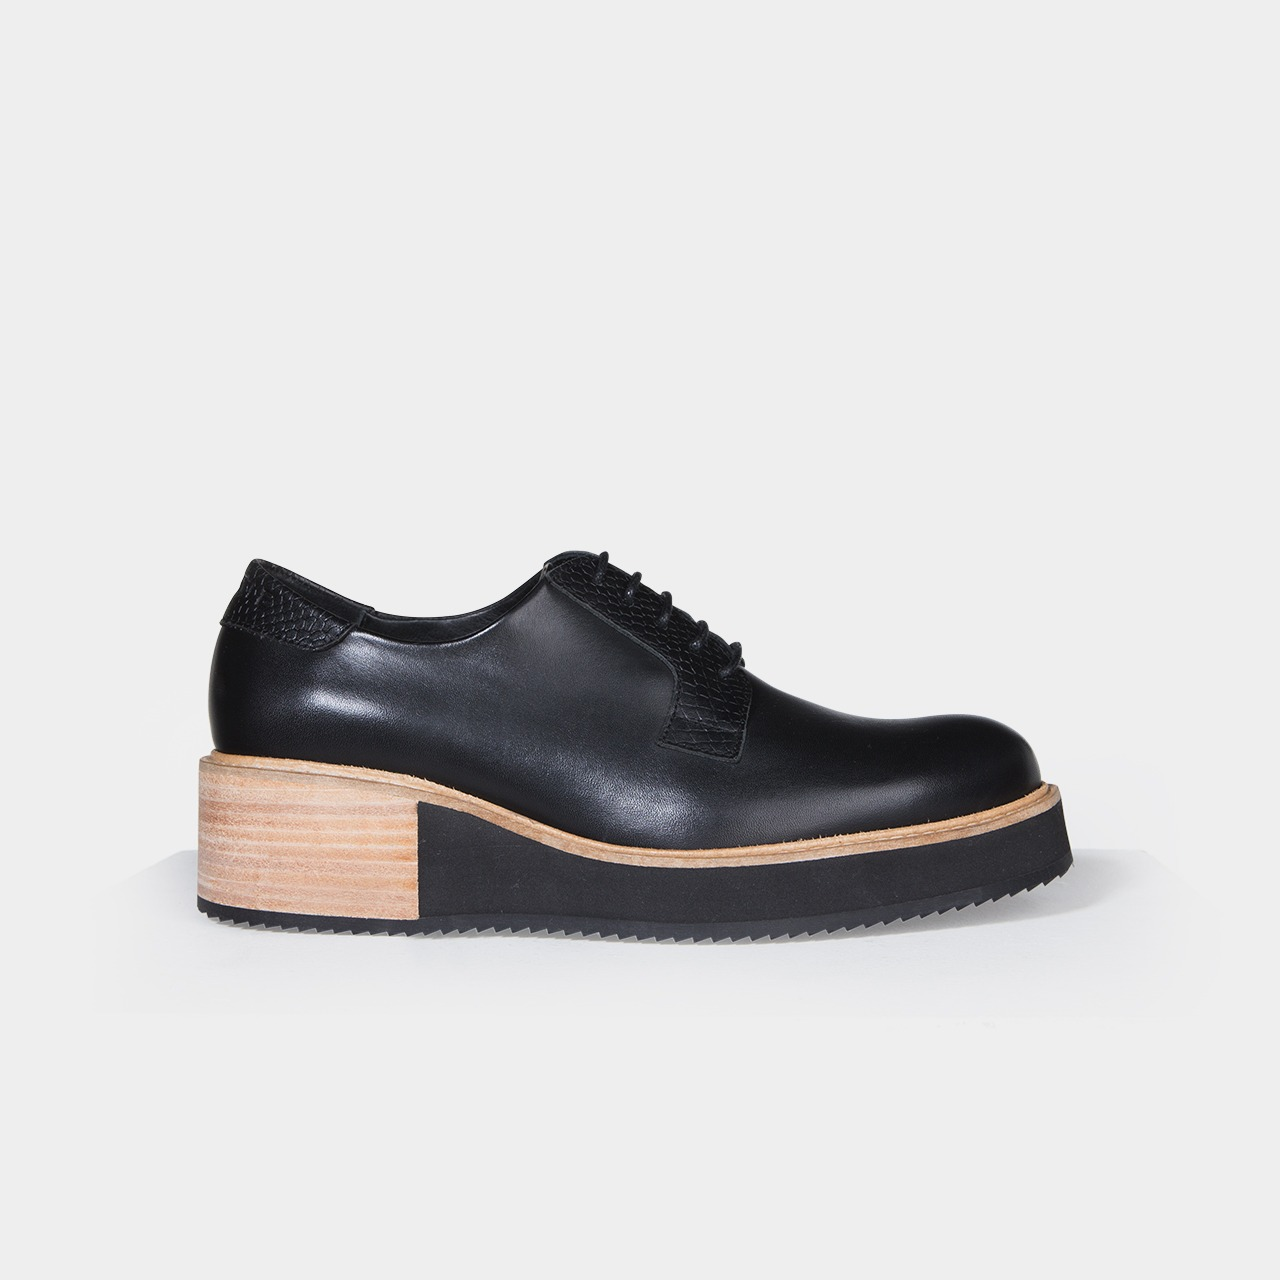 6674defa666 Chaussure Derbies compensées femme Alpha High Noir